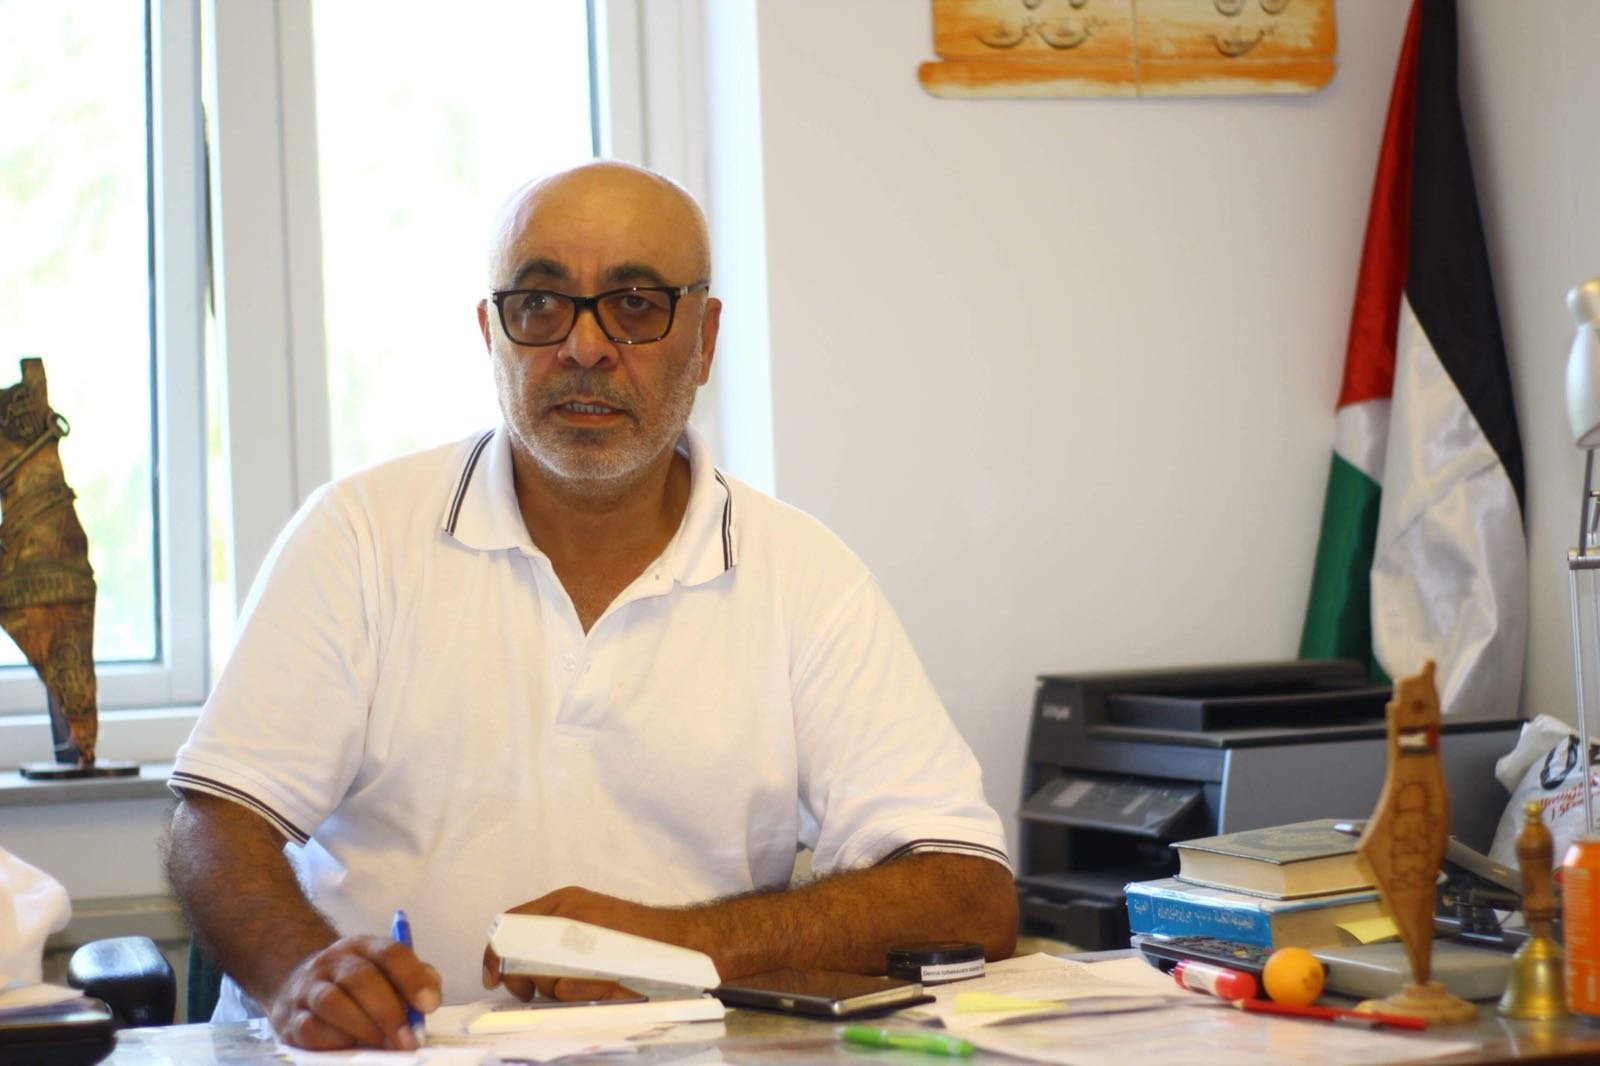 سعيد هدروس... فلسطينيّ مهجّر بطريقه للبرلمان السويديّ-0